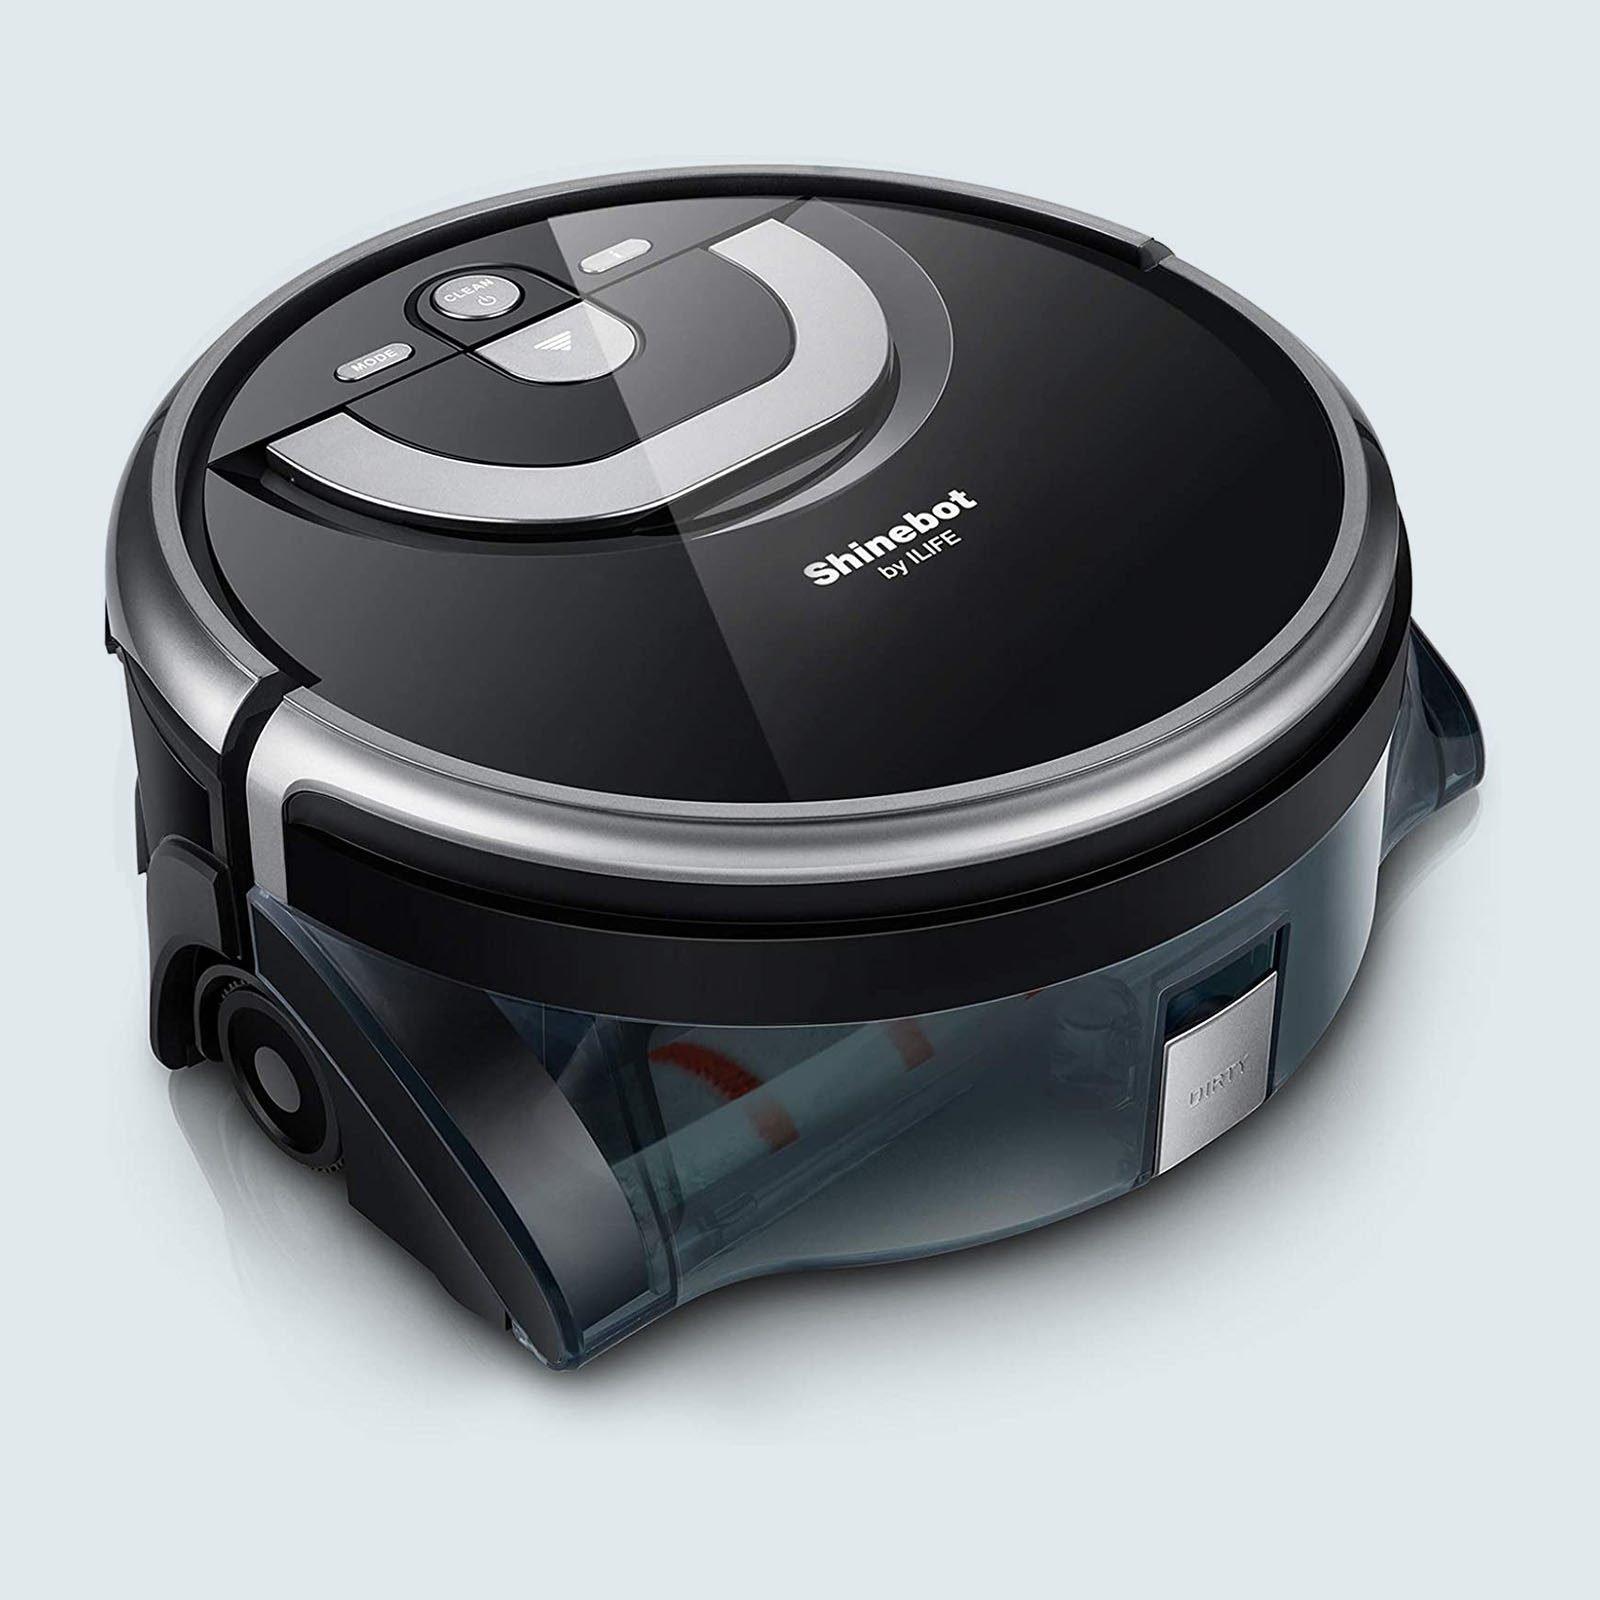 iLife Shinebot W400s Mop Robot